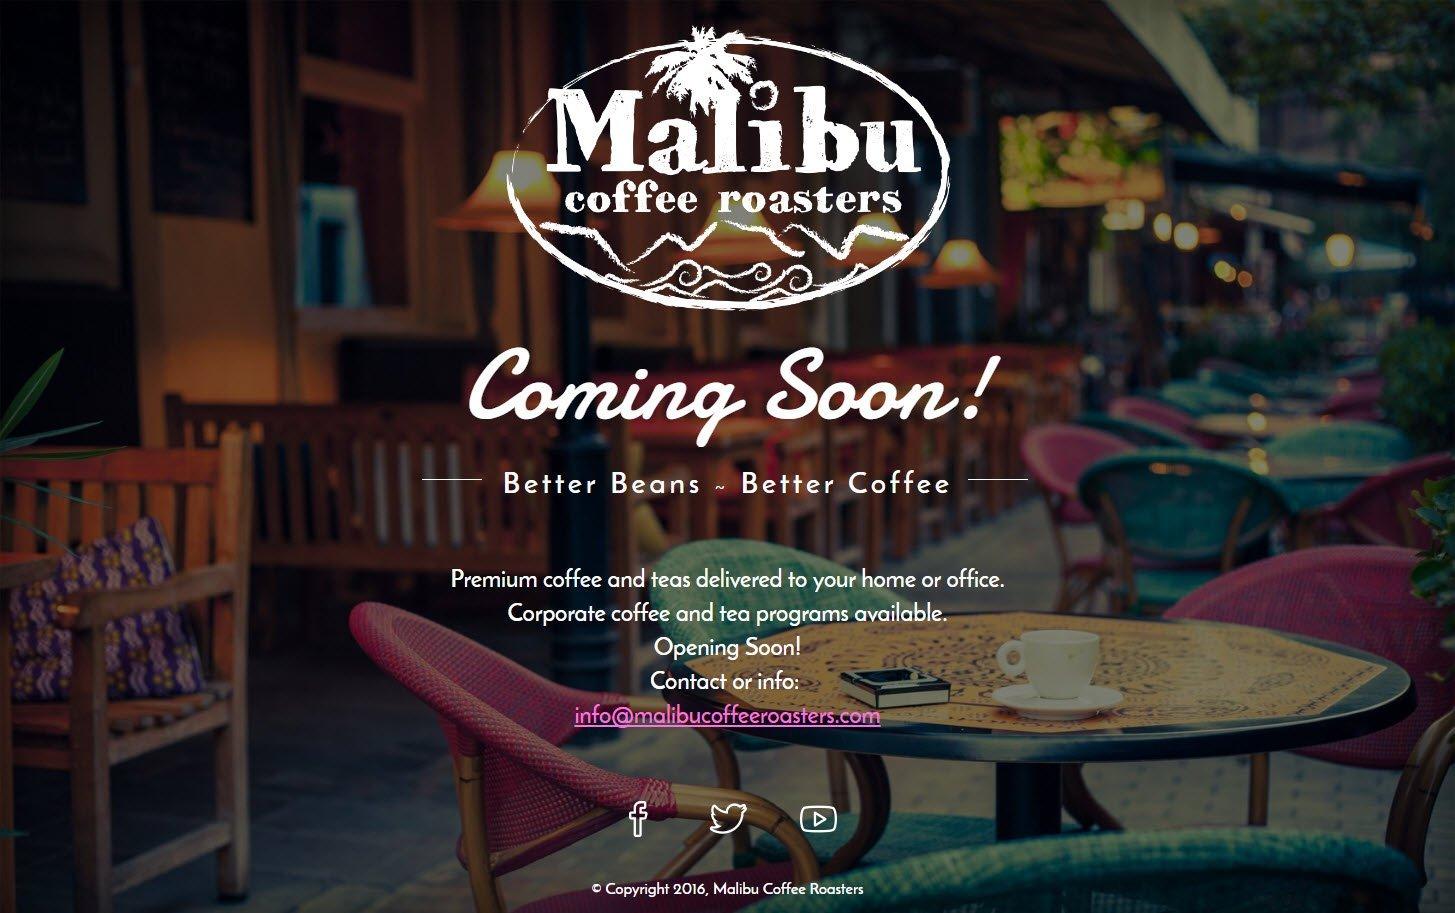 malibu-comingsoon2